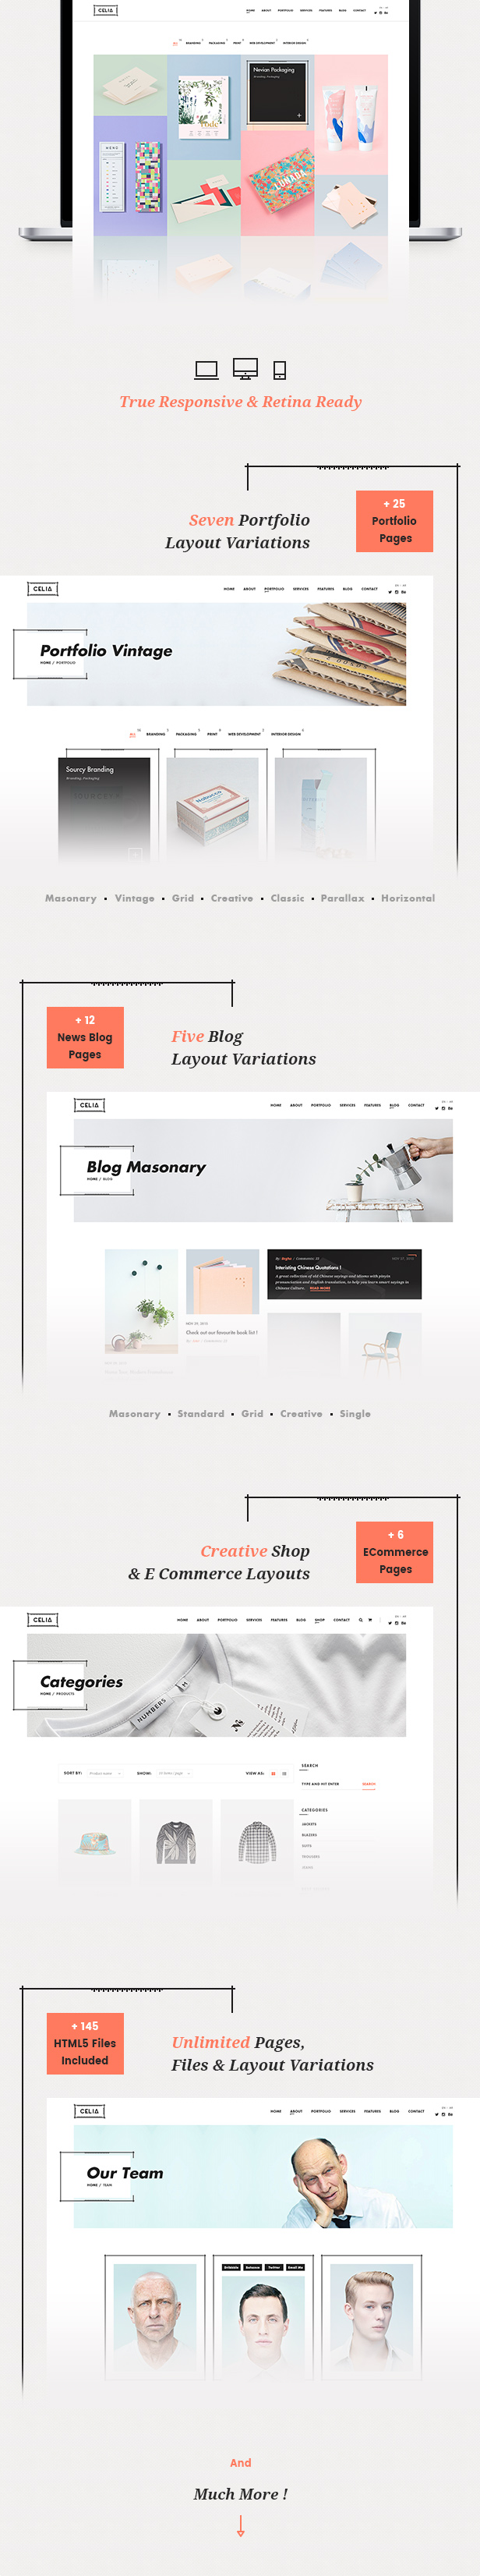 Celia - Innovative and Inspiring Portfolio HTML5 Template for Modern Agencies and Freelancers - 3